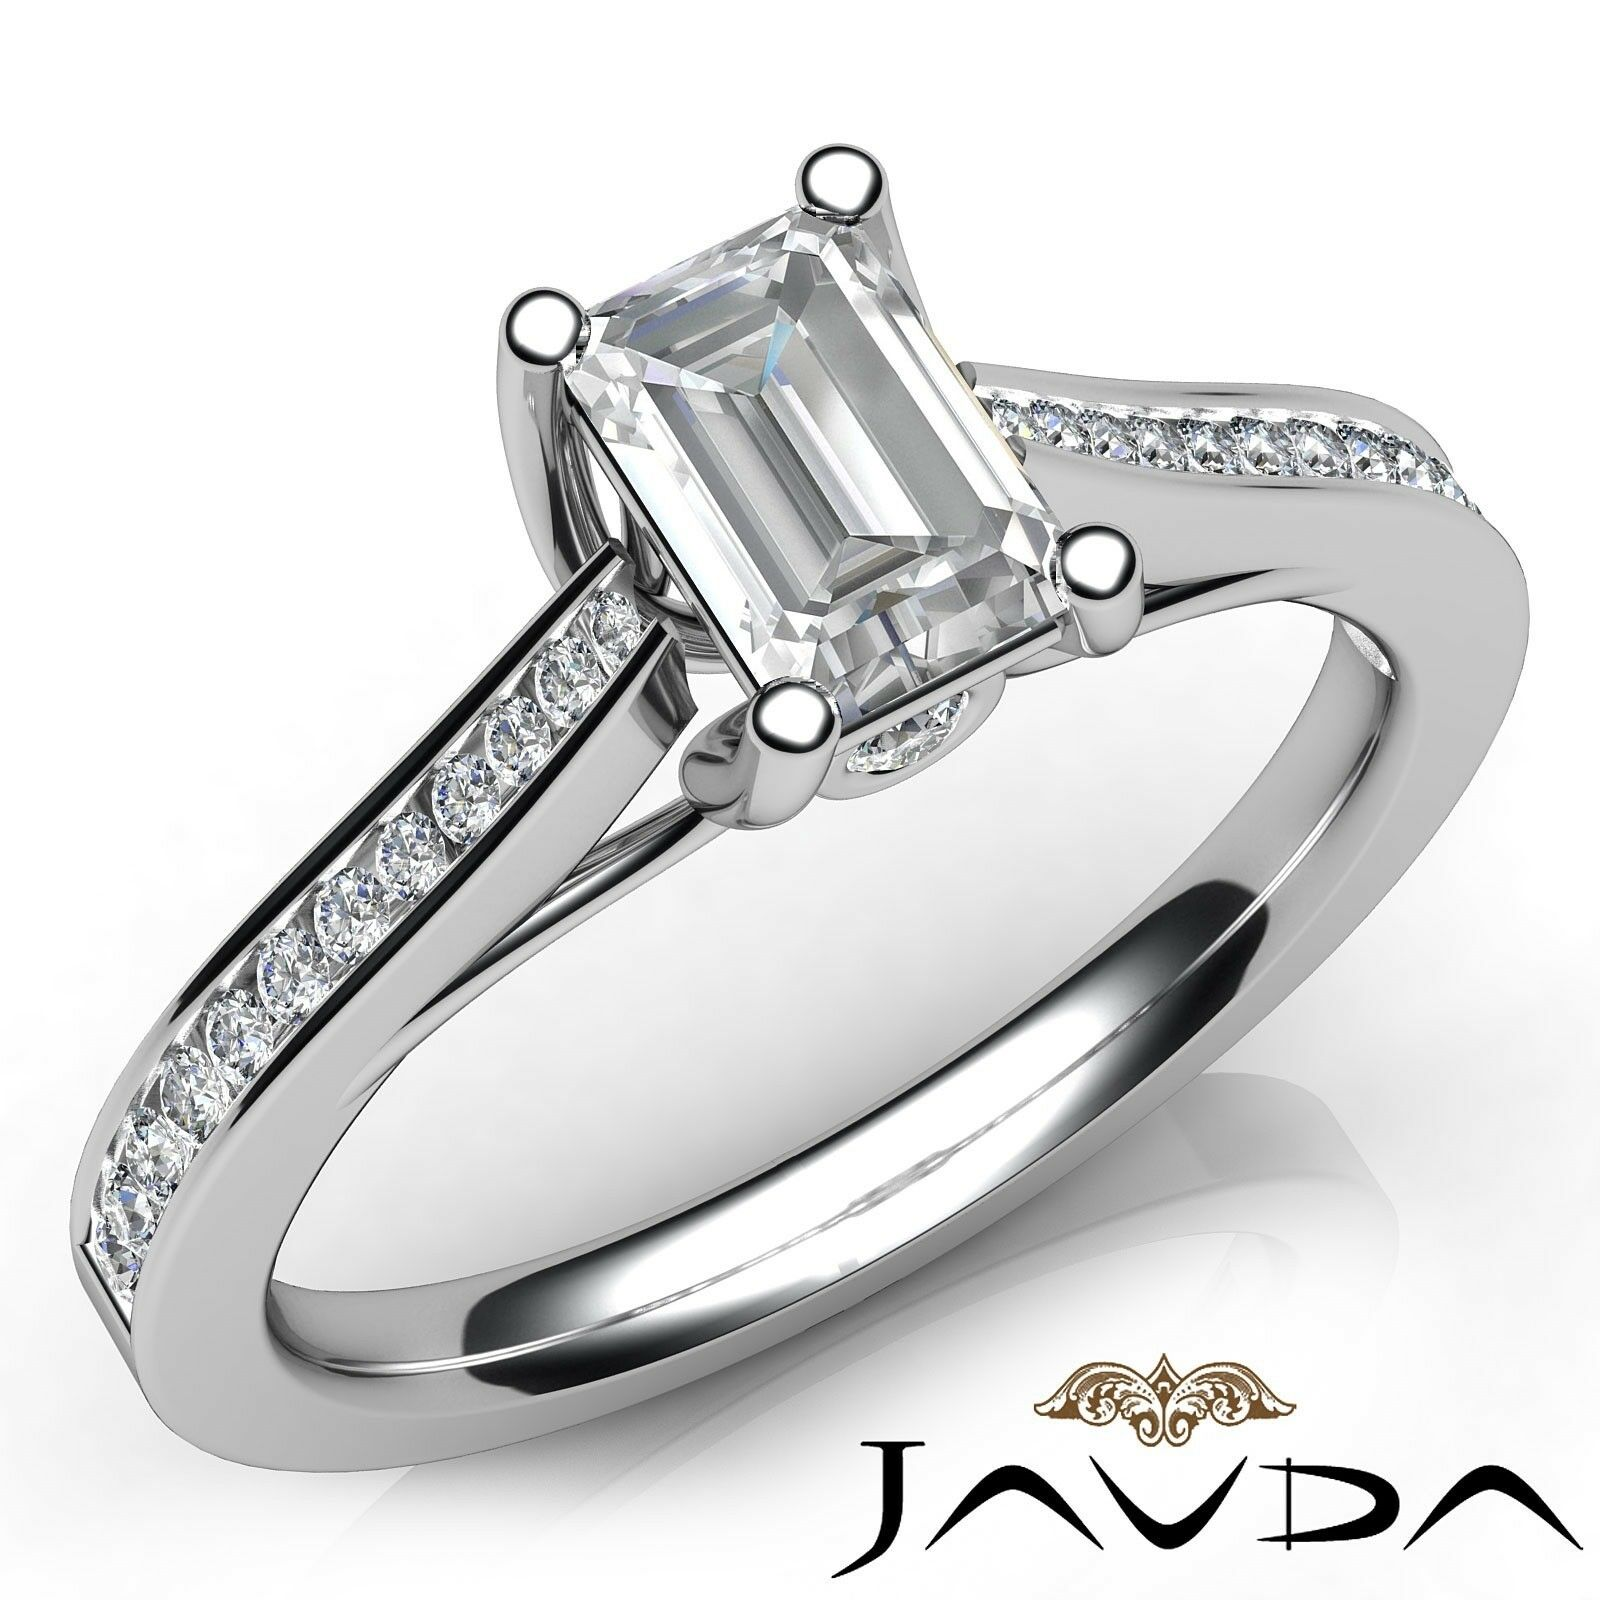 0.8ctw Channel Set Stone Emerald Diamond Engagement Ring GIA E-VS1 White Gold